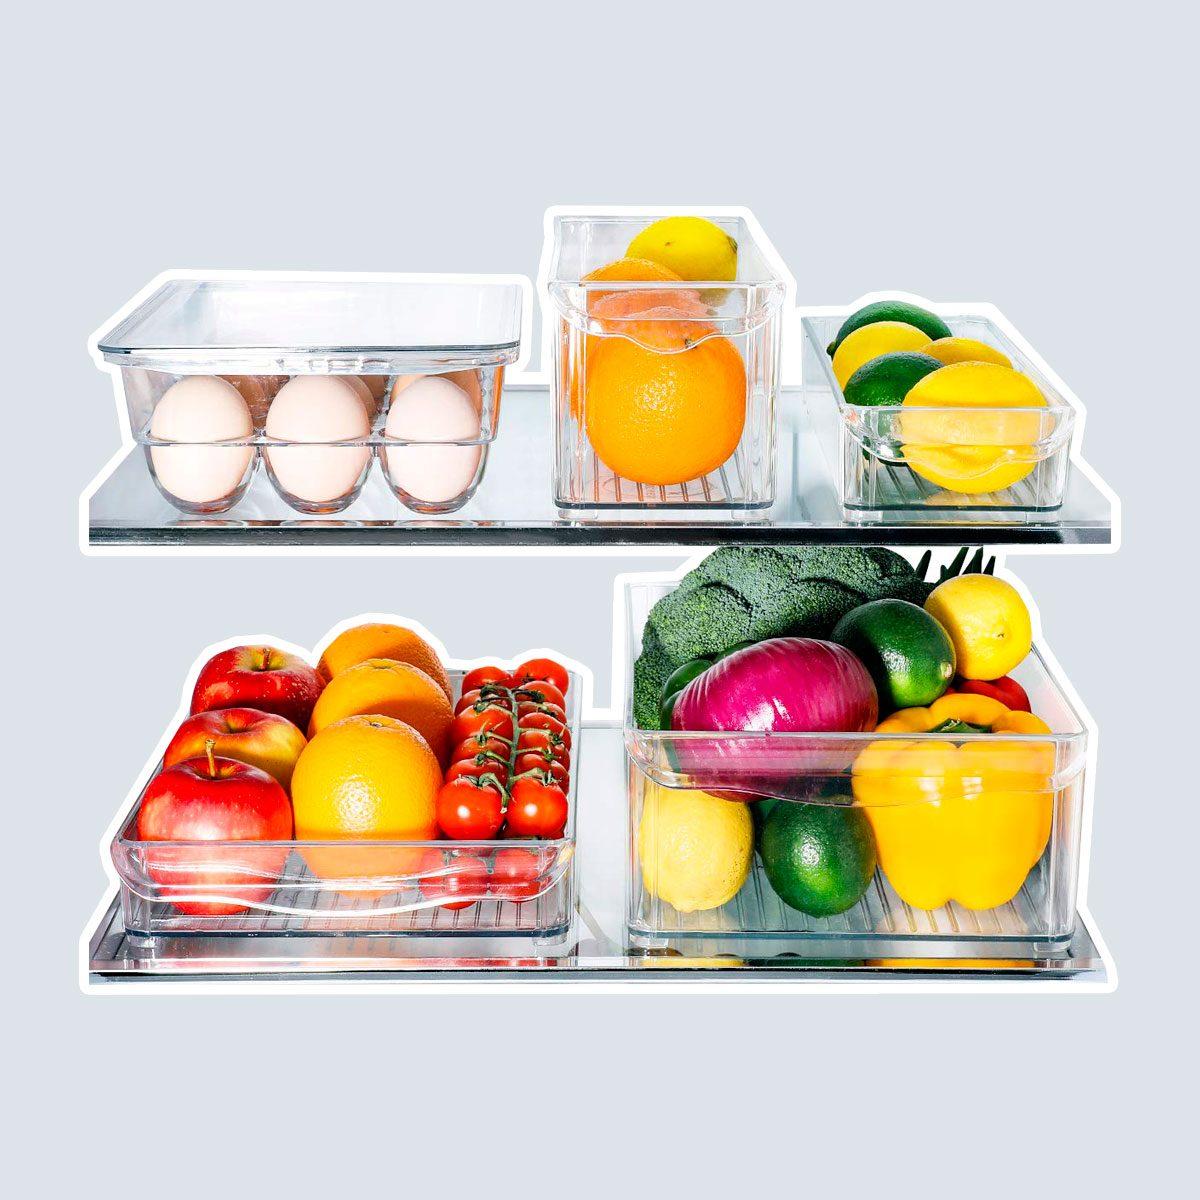 E-Gtong Fridge and Freezer Bins with Handles